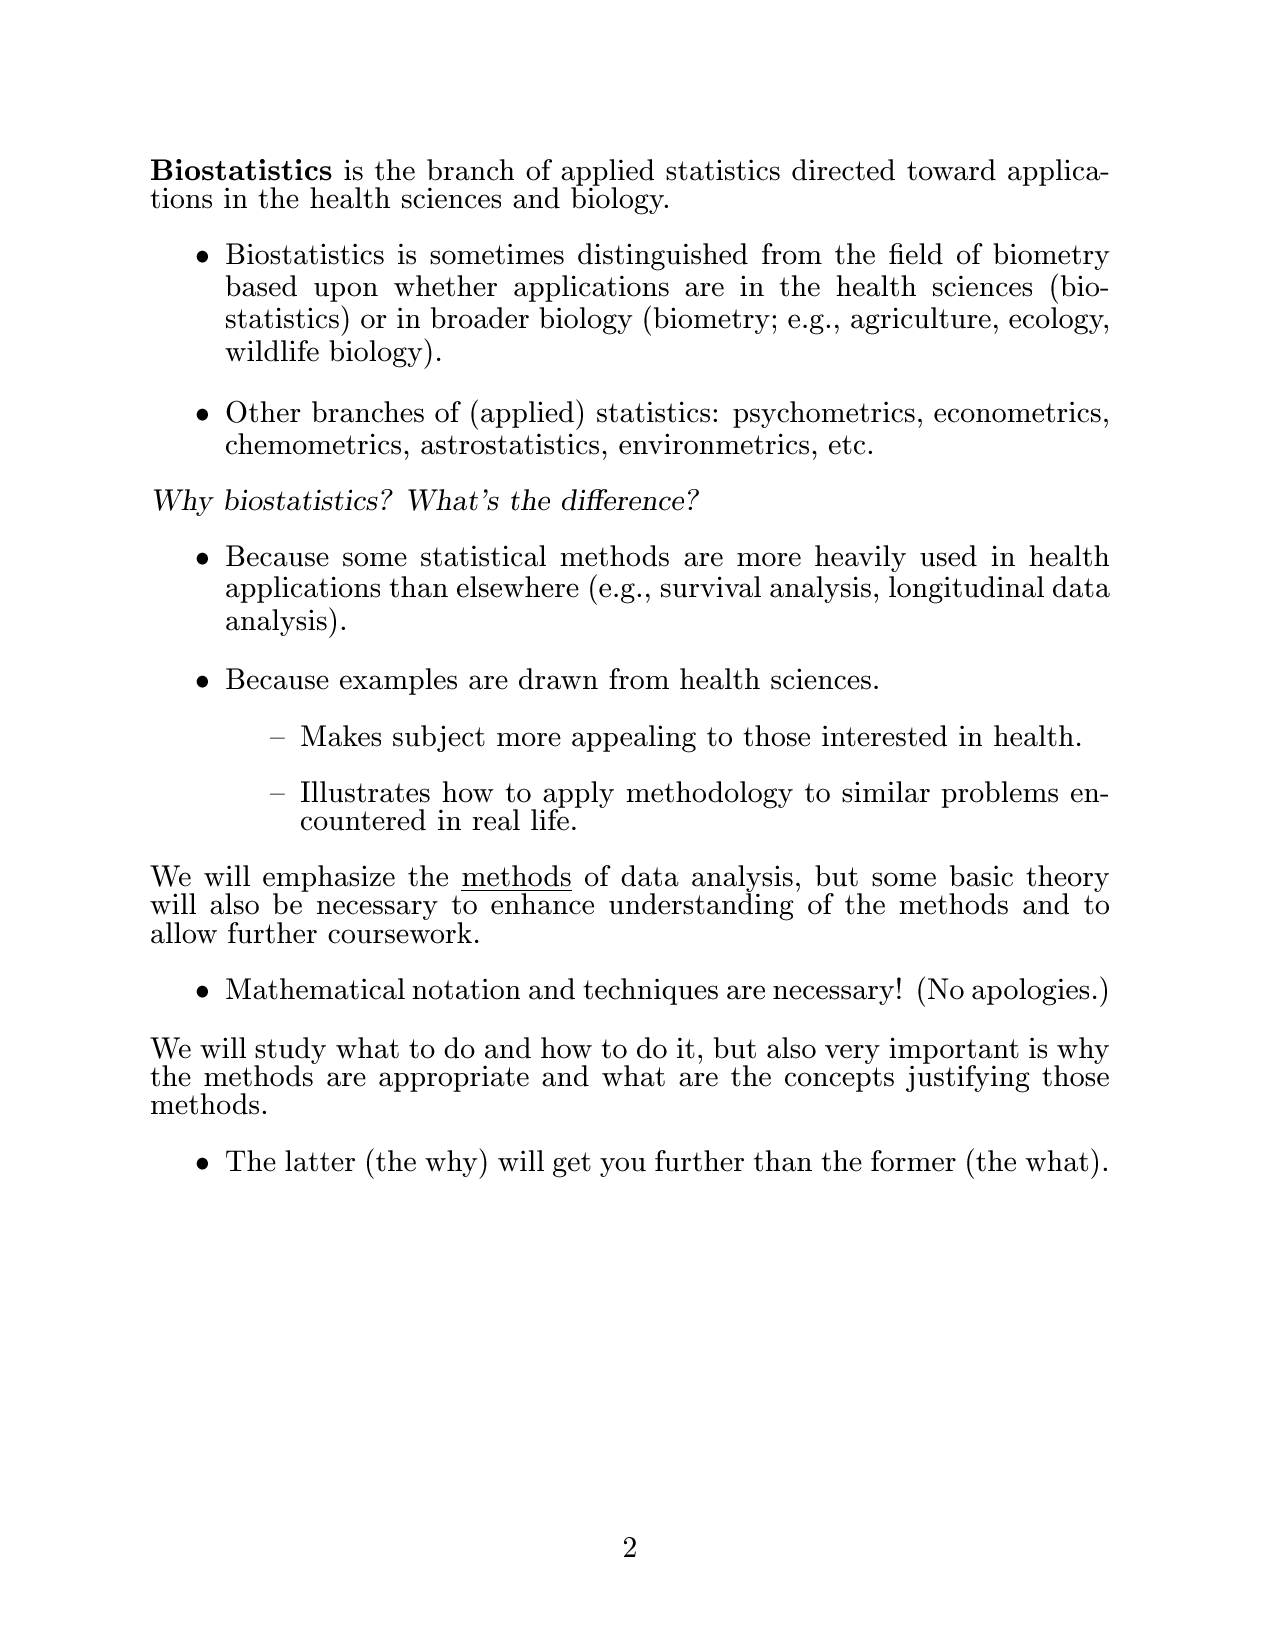 Resume help biostatistician